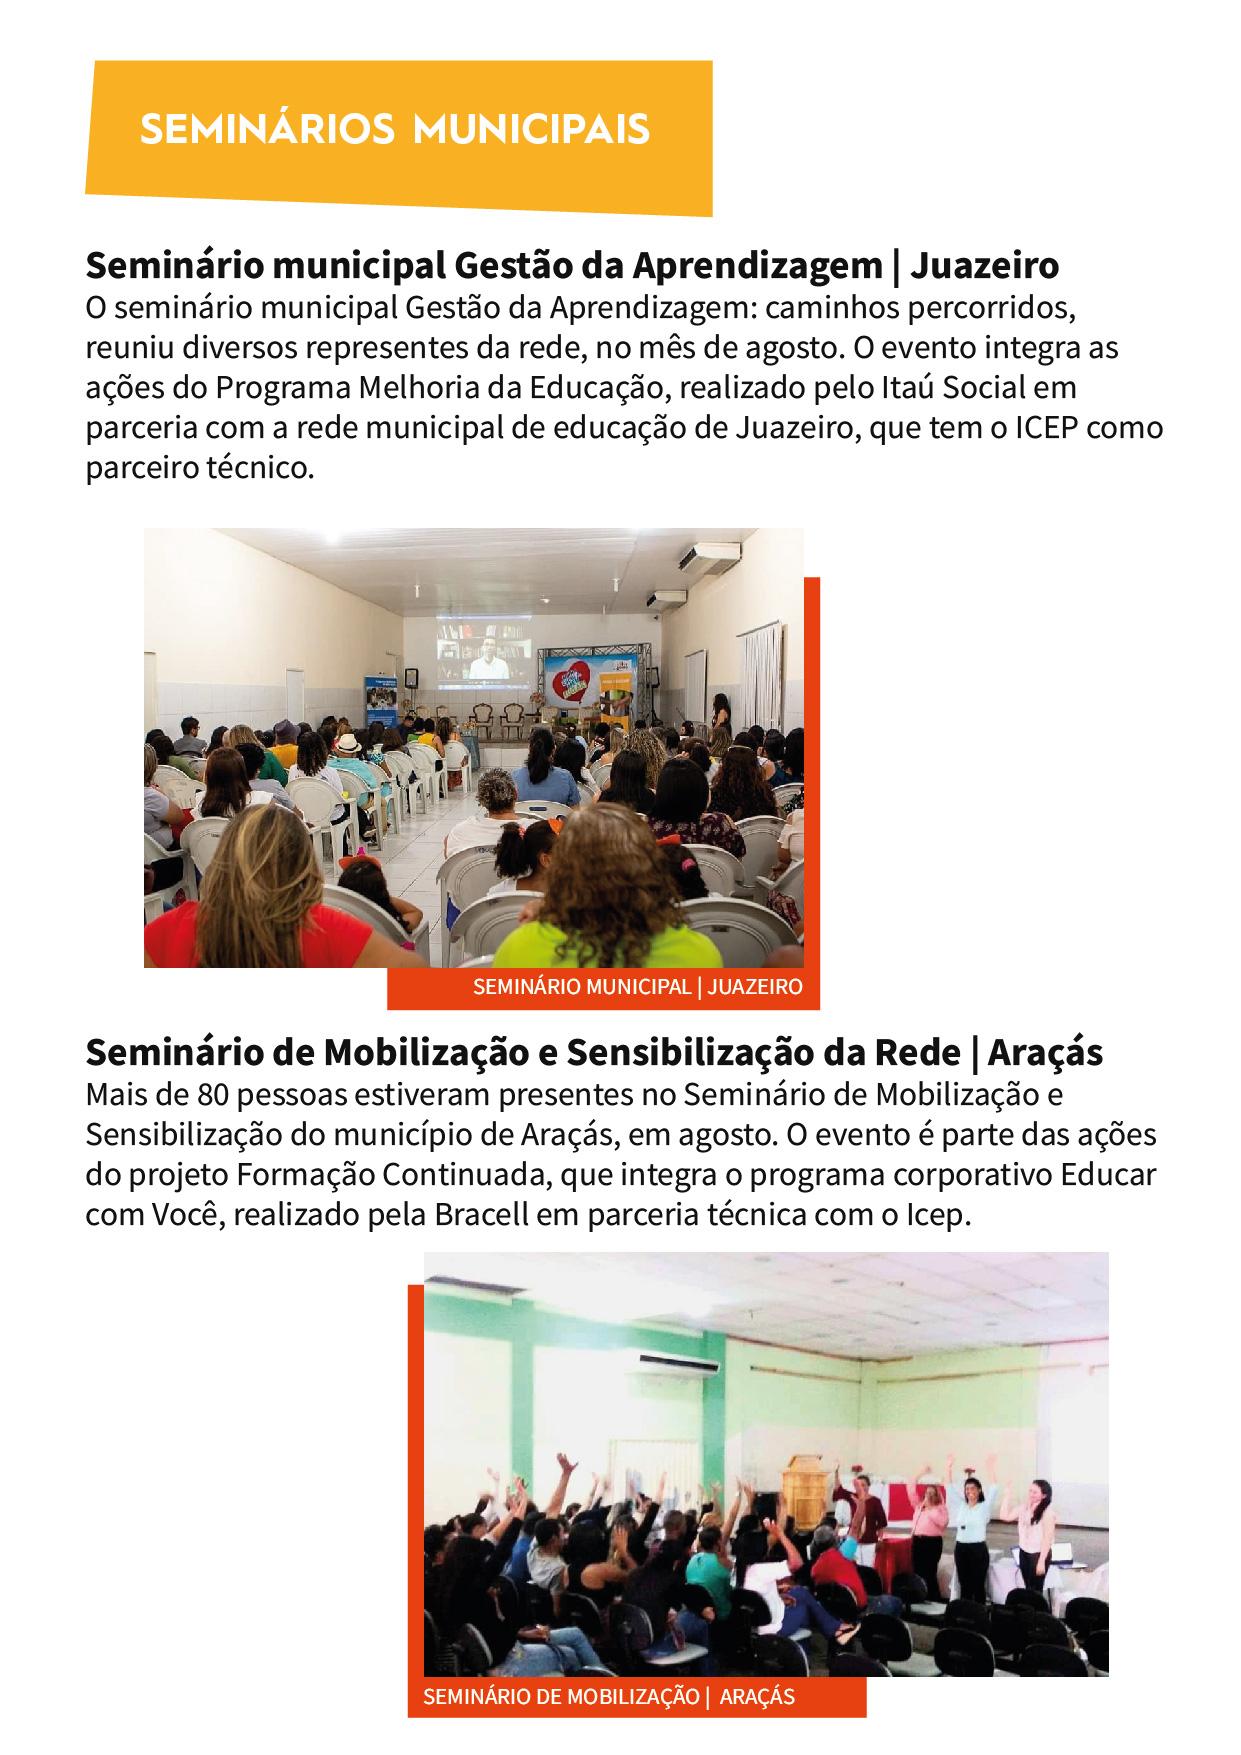 ICEP - Boletim edição 2, versão impressa_Fundo